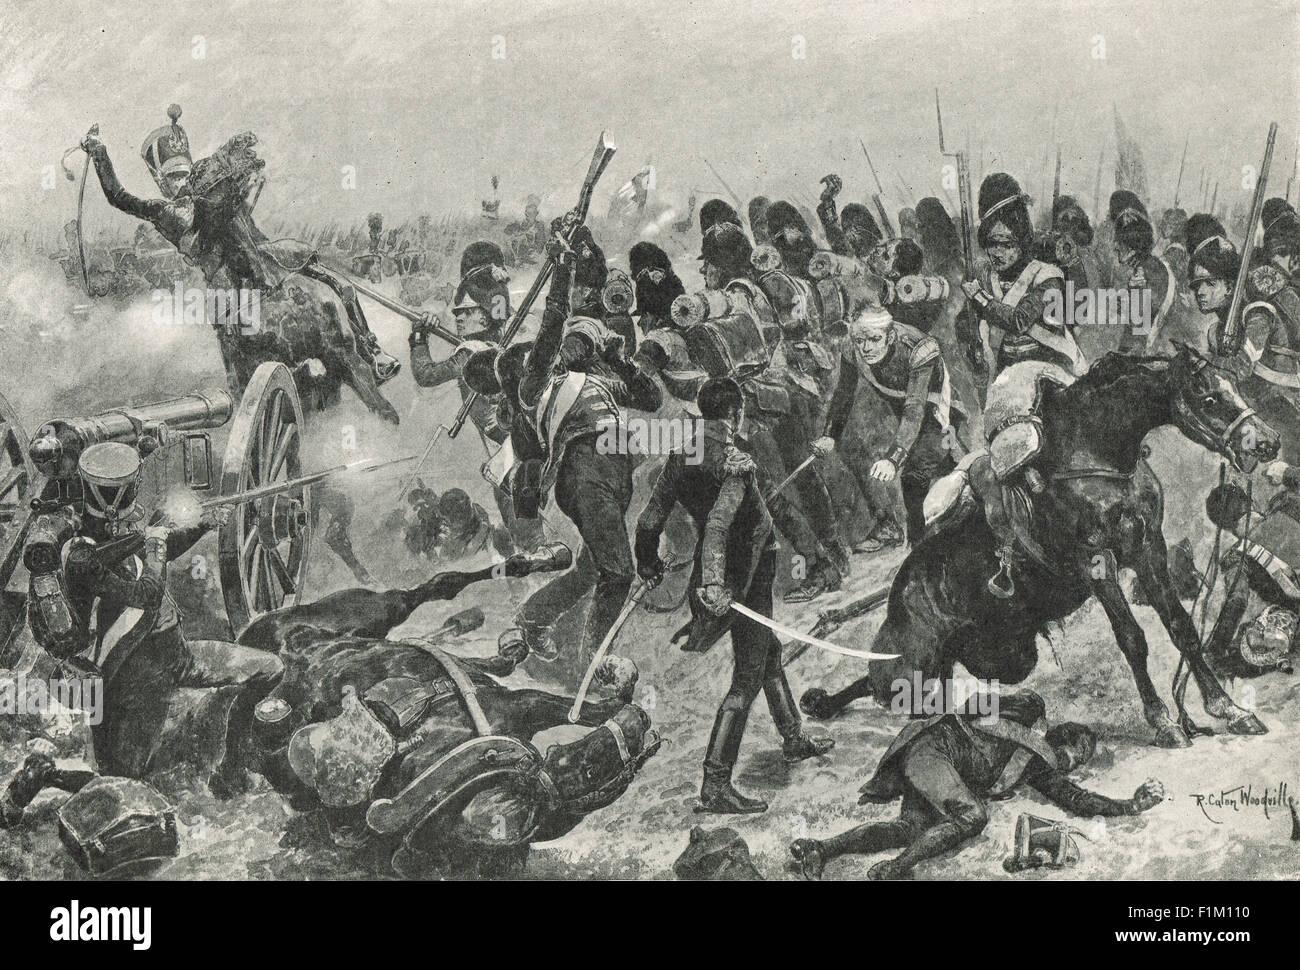 Charge of 3rd division at Salamanca 1812